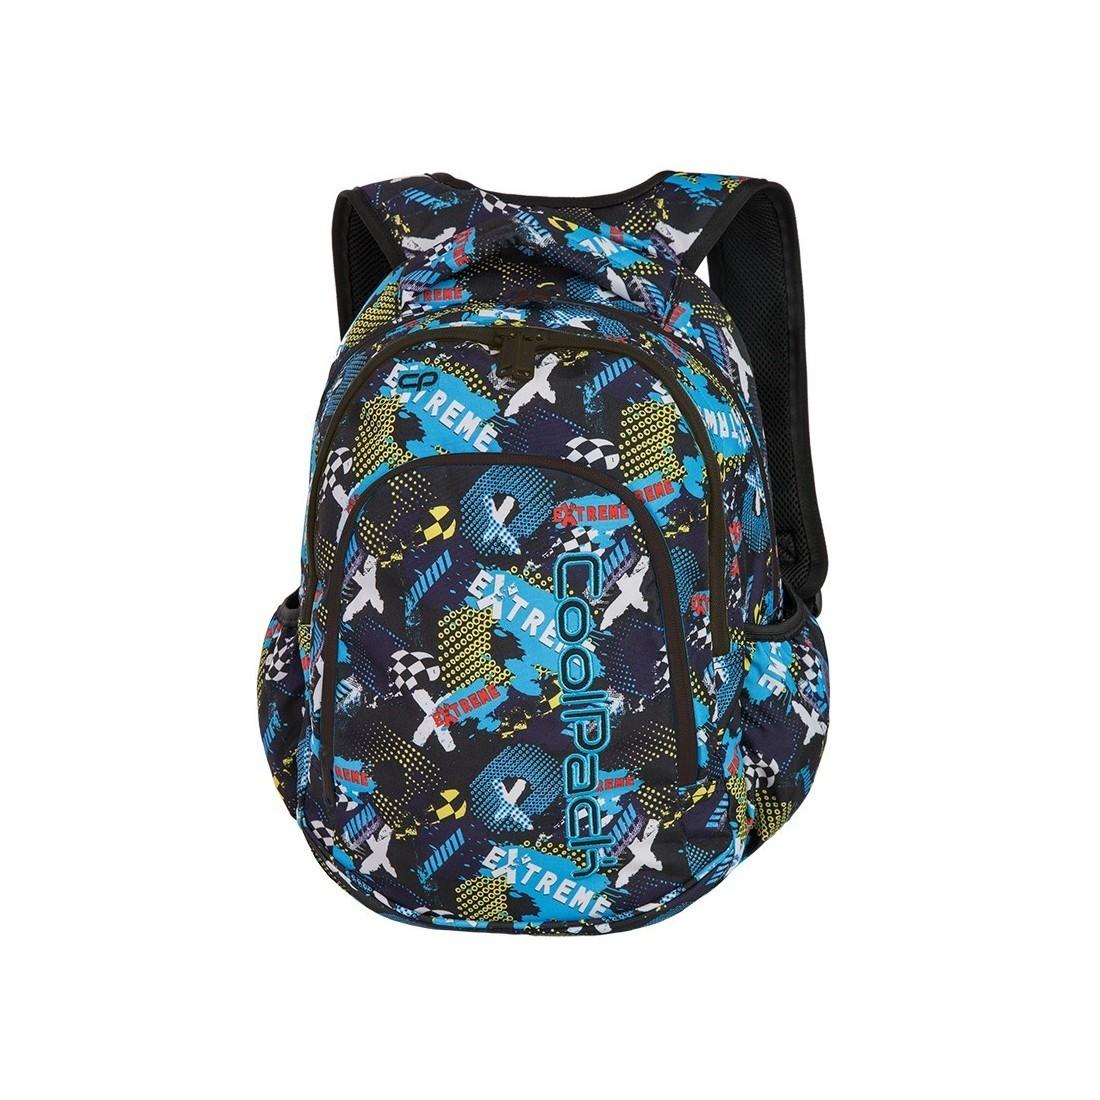 fa40663256c5c ... chłopca -  Plecak do szkoły (klasy 1-3) CoolPack CP PRIME EXTREME dla  ucznia ...